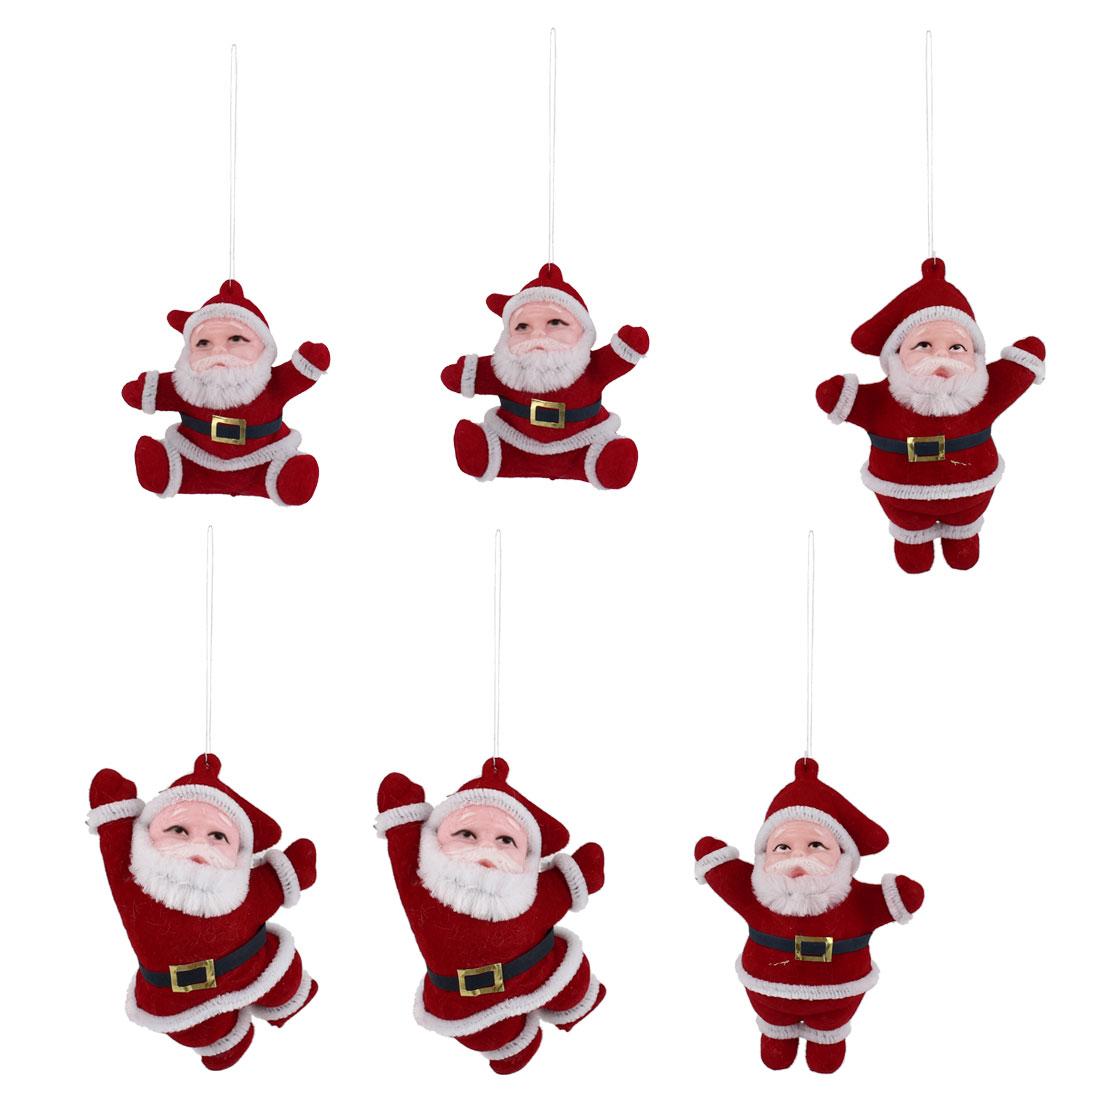 Christmas Xmas Tree Hanging Santa Claus Dangling Decor Red White 6pcs